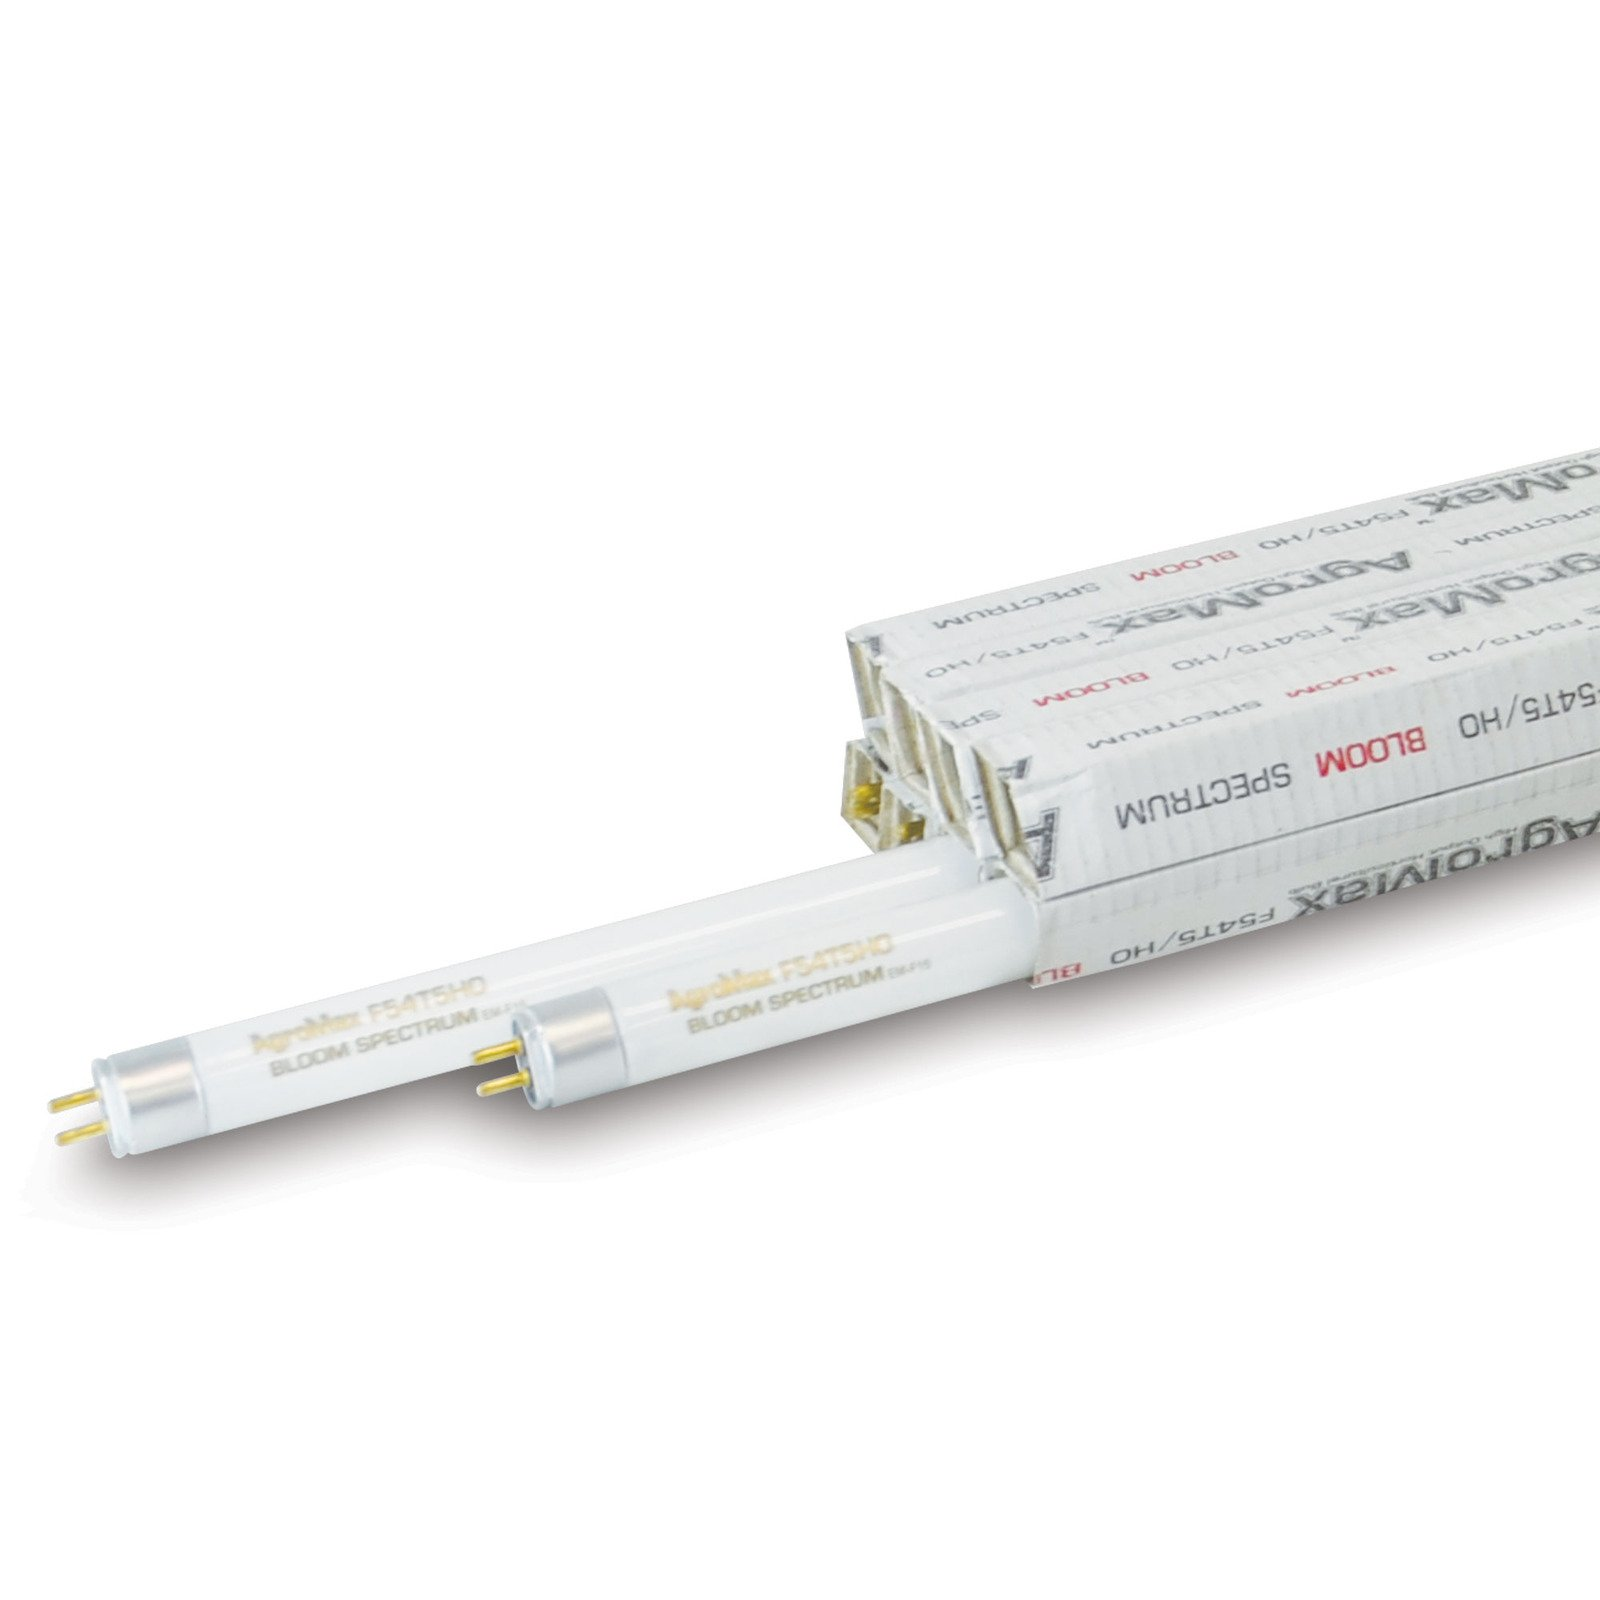 8-Pack AgroMax 4 Foot (45.75'') 3,000K Bloom T5 Fluorescent Grow Light Bulbs - (8) F54T5HO Bulbs